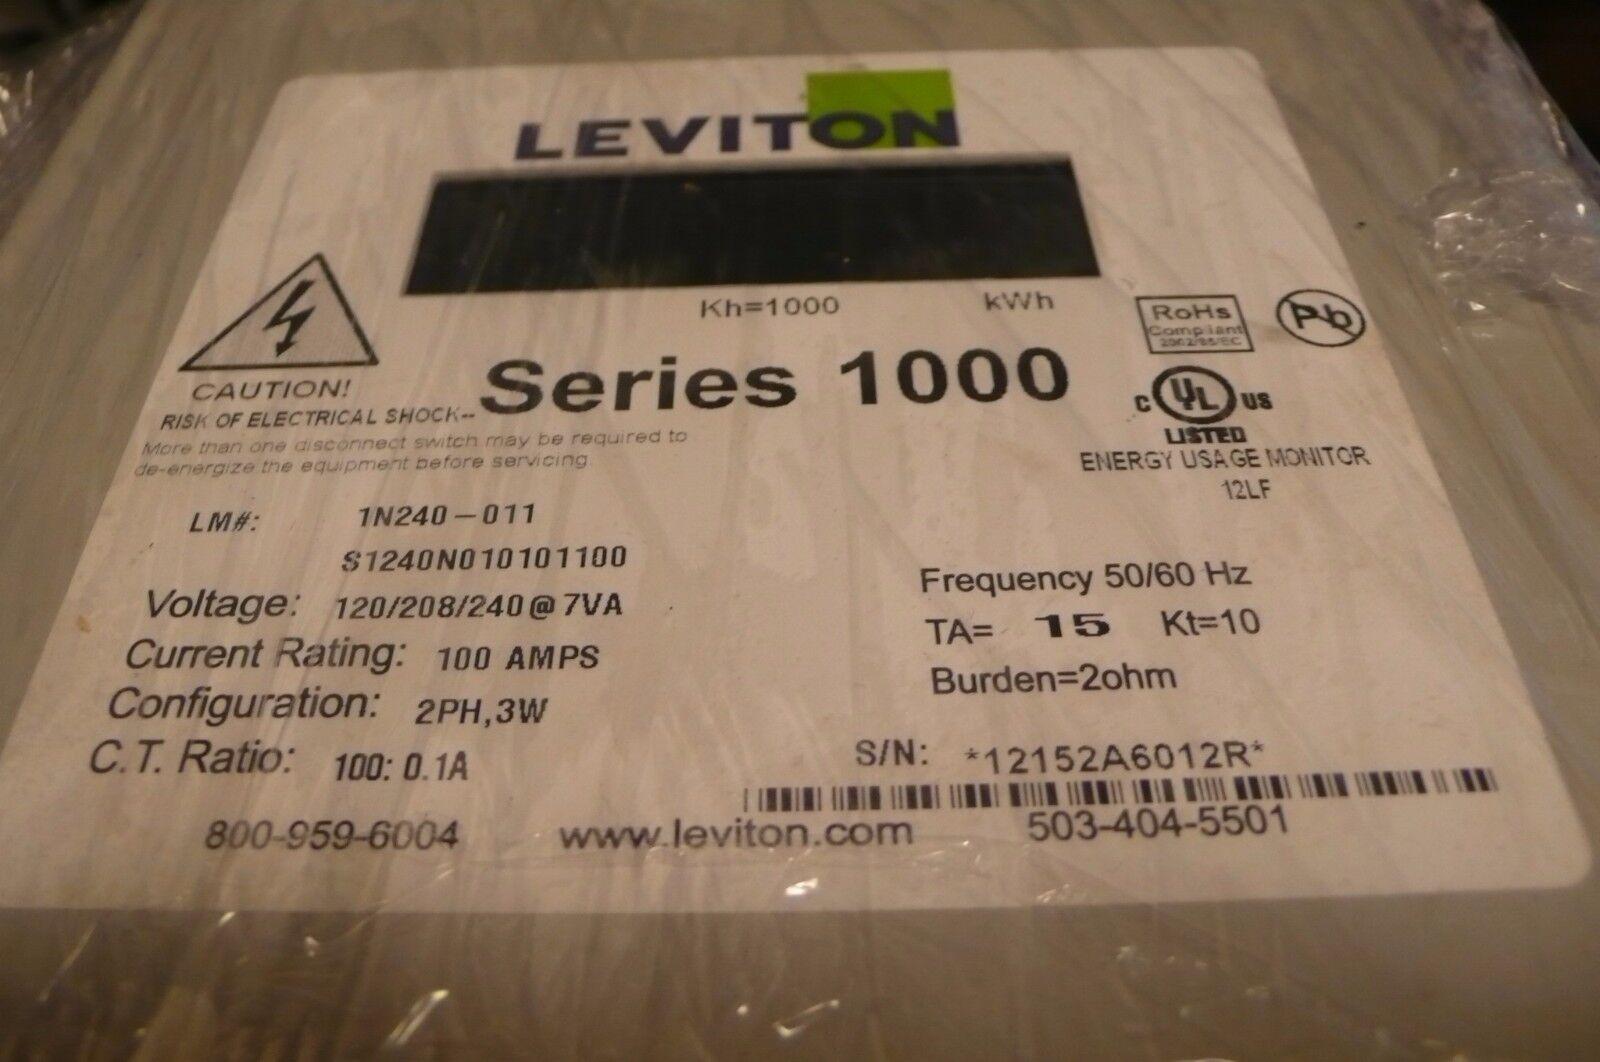 Leviton 1n240-011 Meter Series 1000 100 Amps | eBay